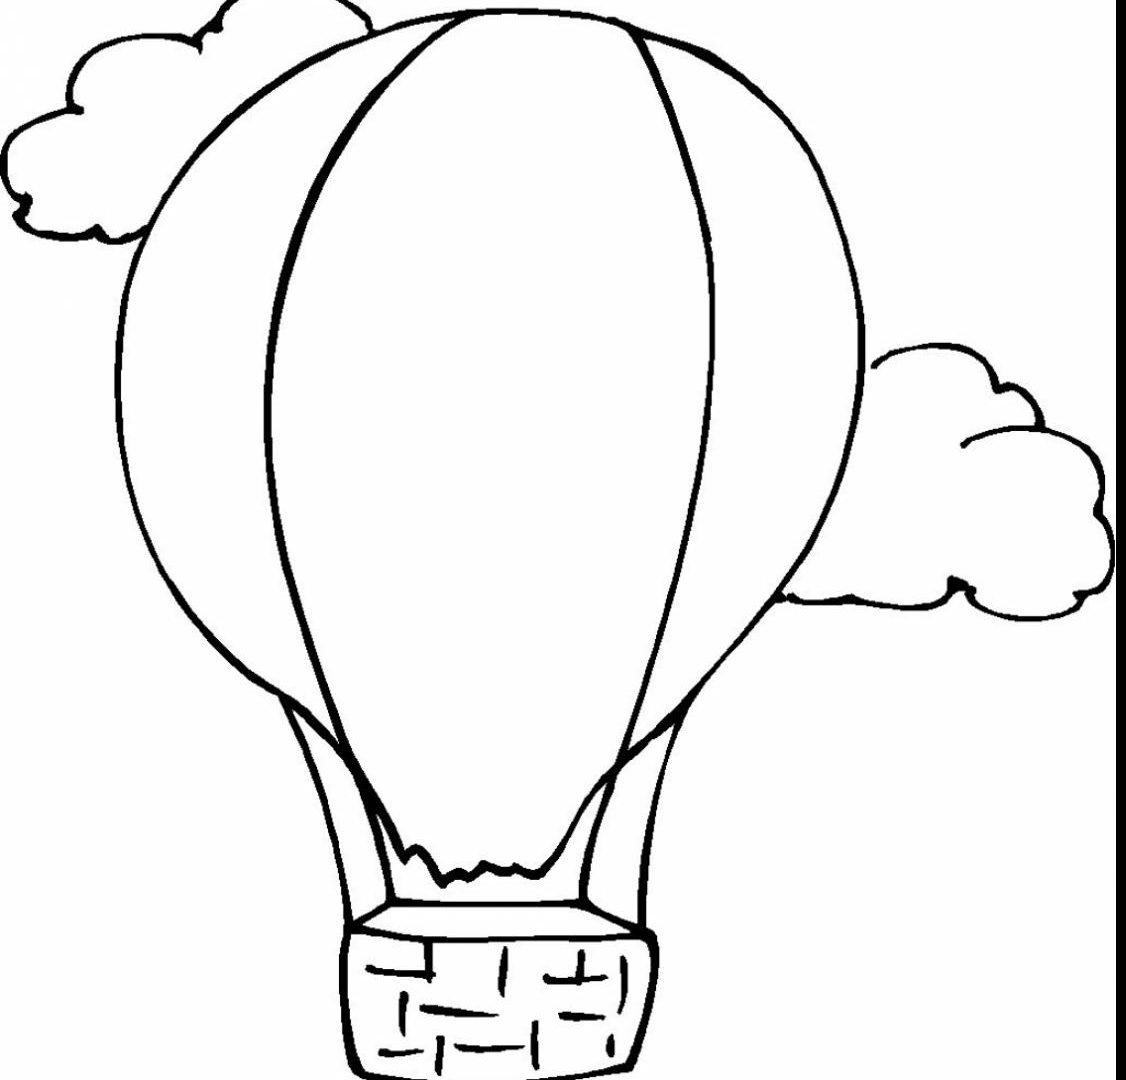 1126x1080 Hot Air Balloon Coloring Pages Clipart Panda Free Printable Kids